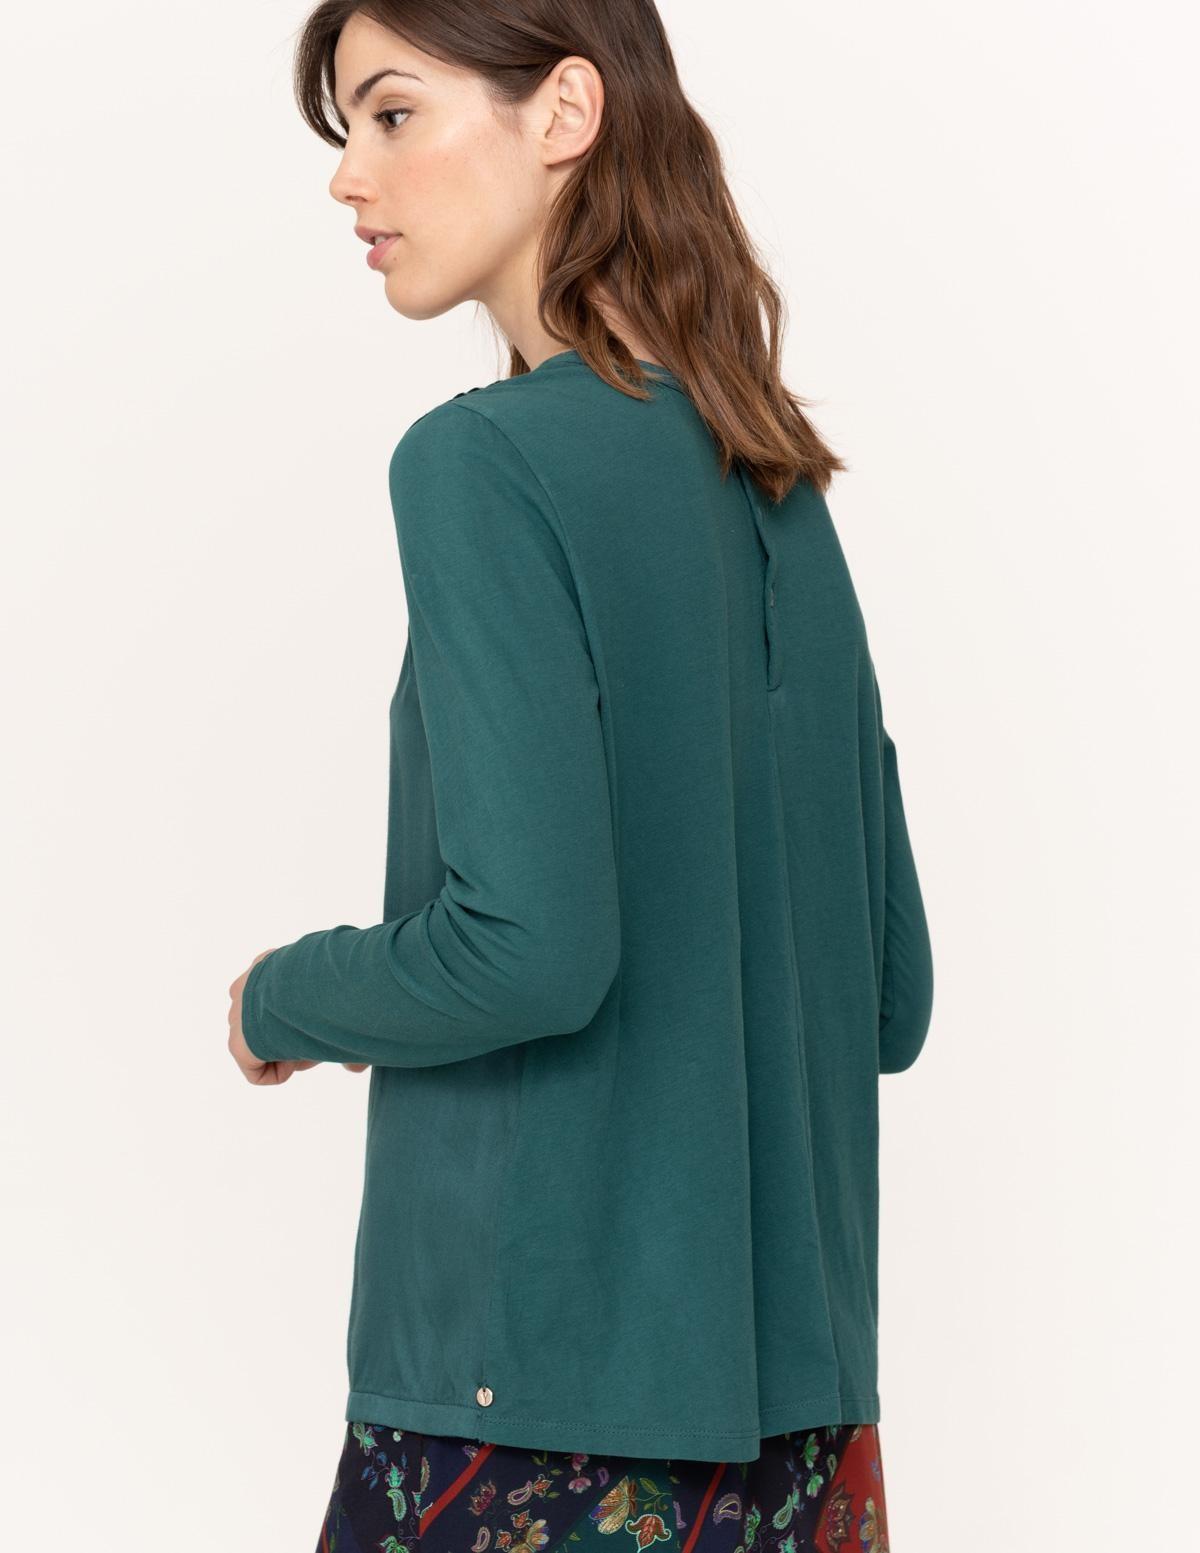 Camiseta fruncidos tejidos combinados - Ítem1